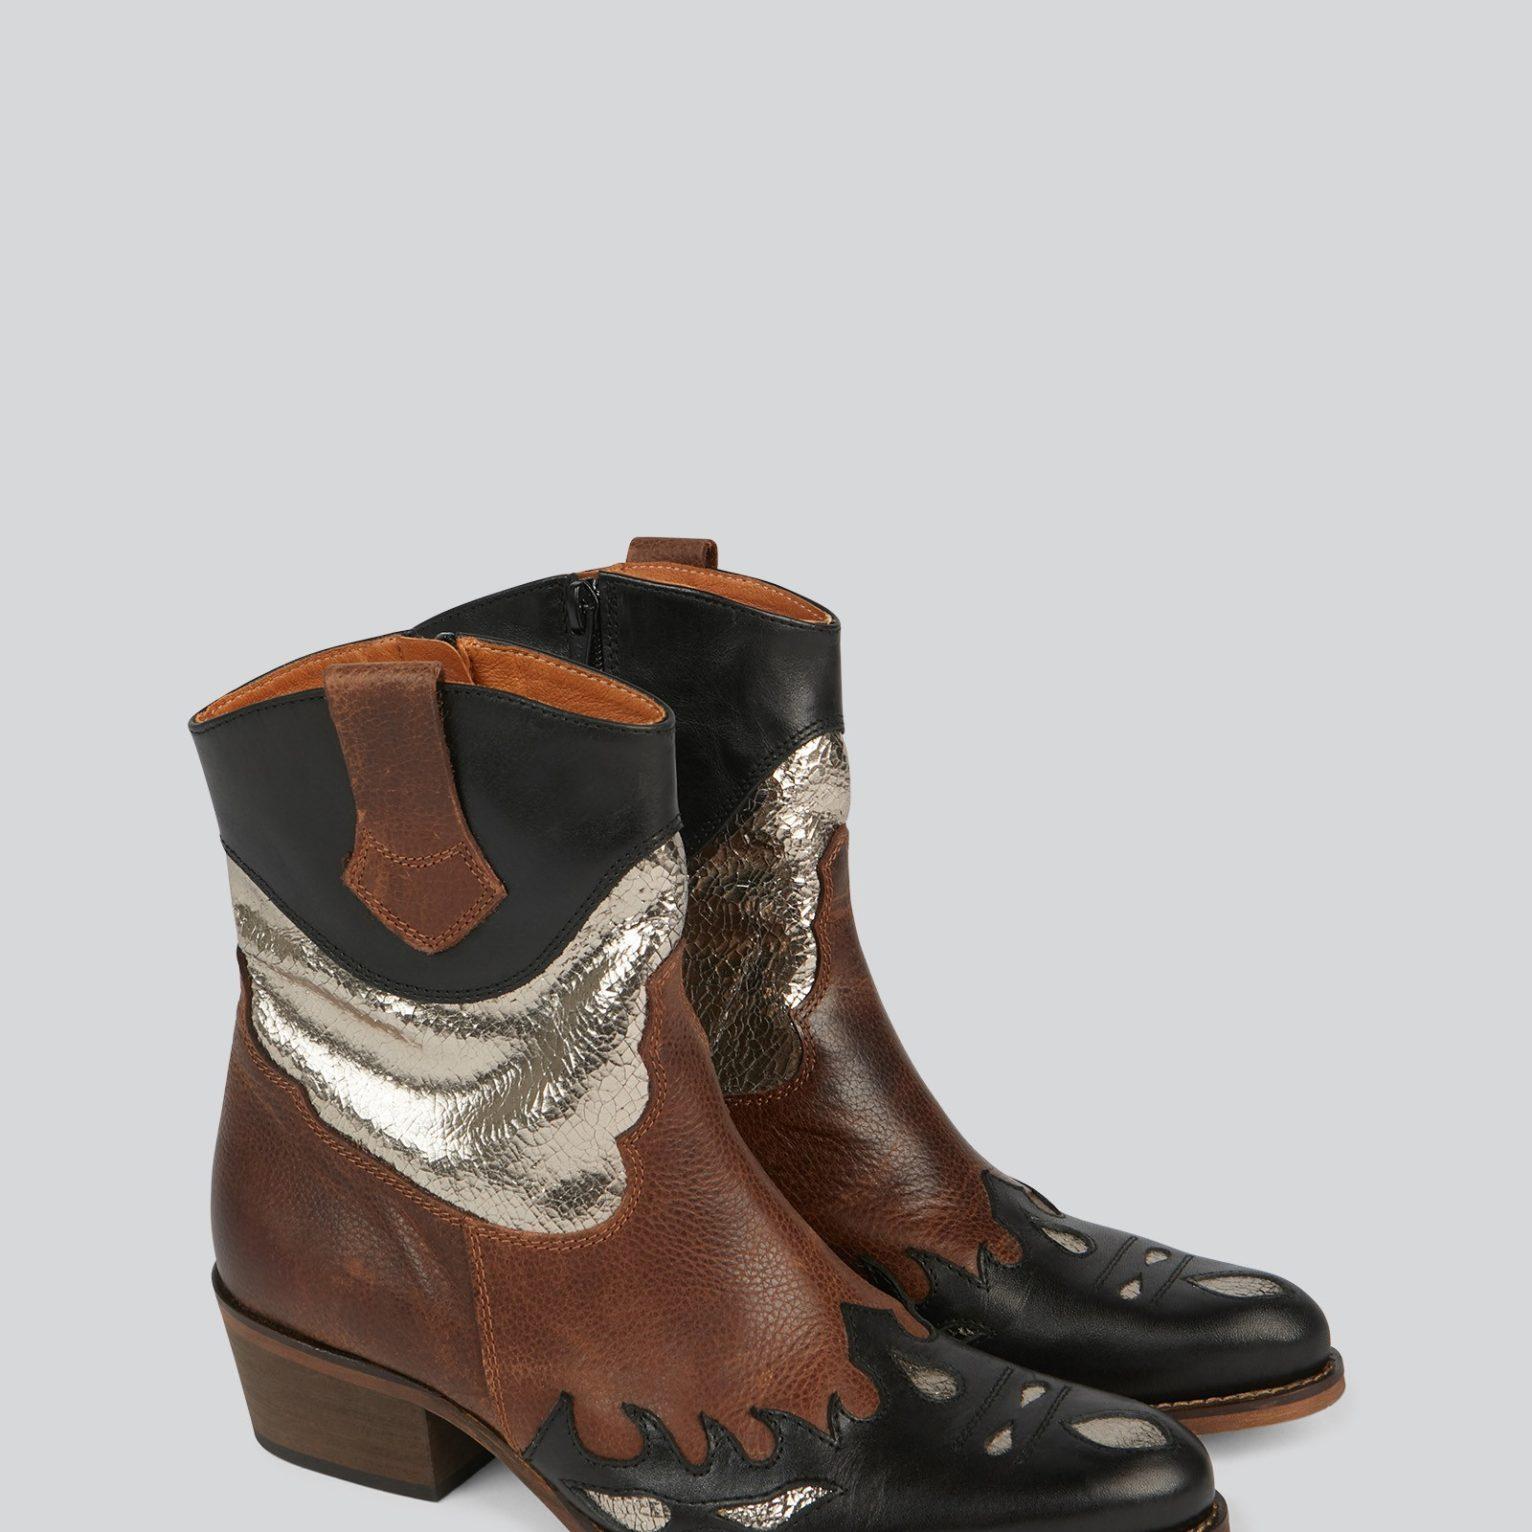 Botas cowboy ankle